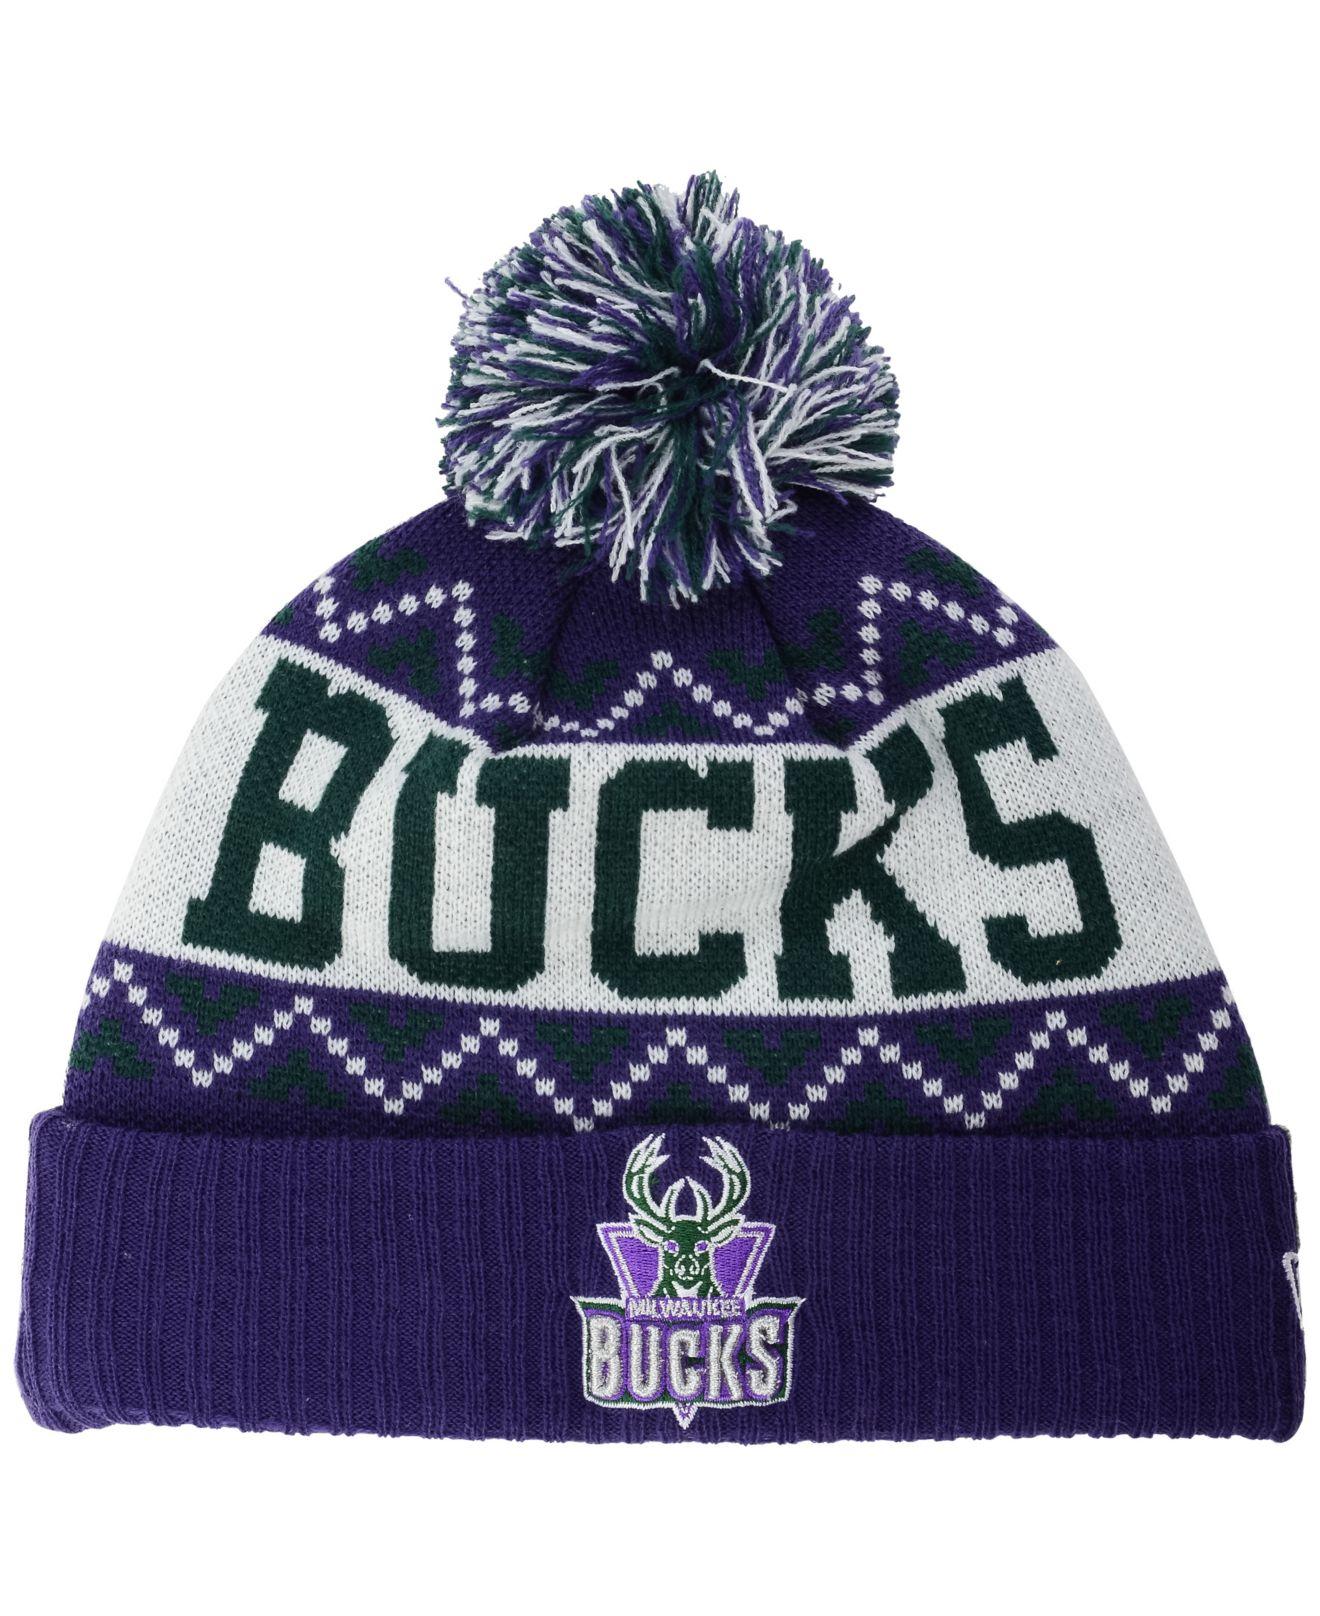 51daa2ec7 shop milwaukee bucks beanie purple 8fdc3 7ad0f